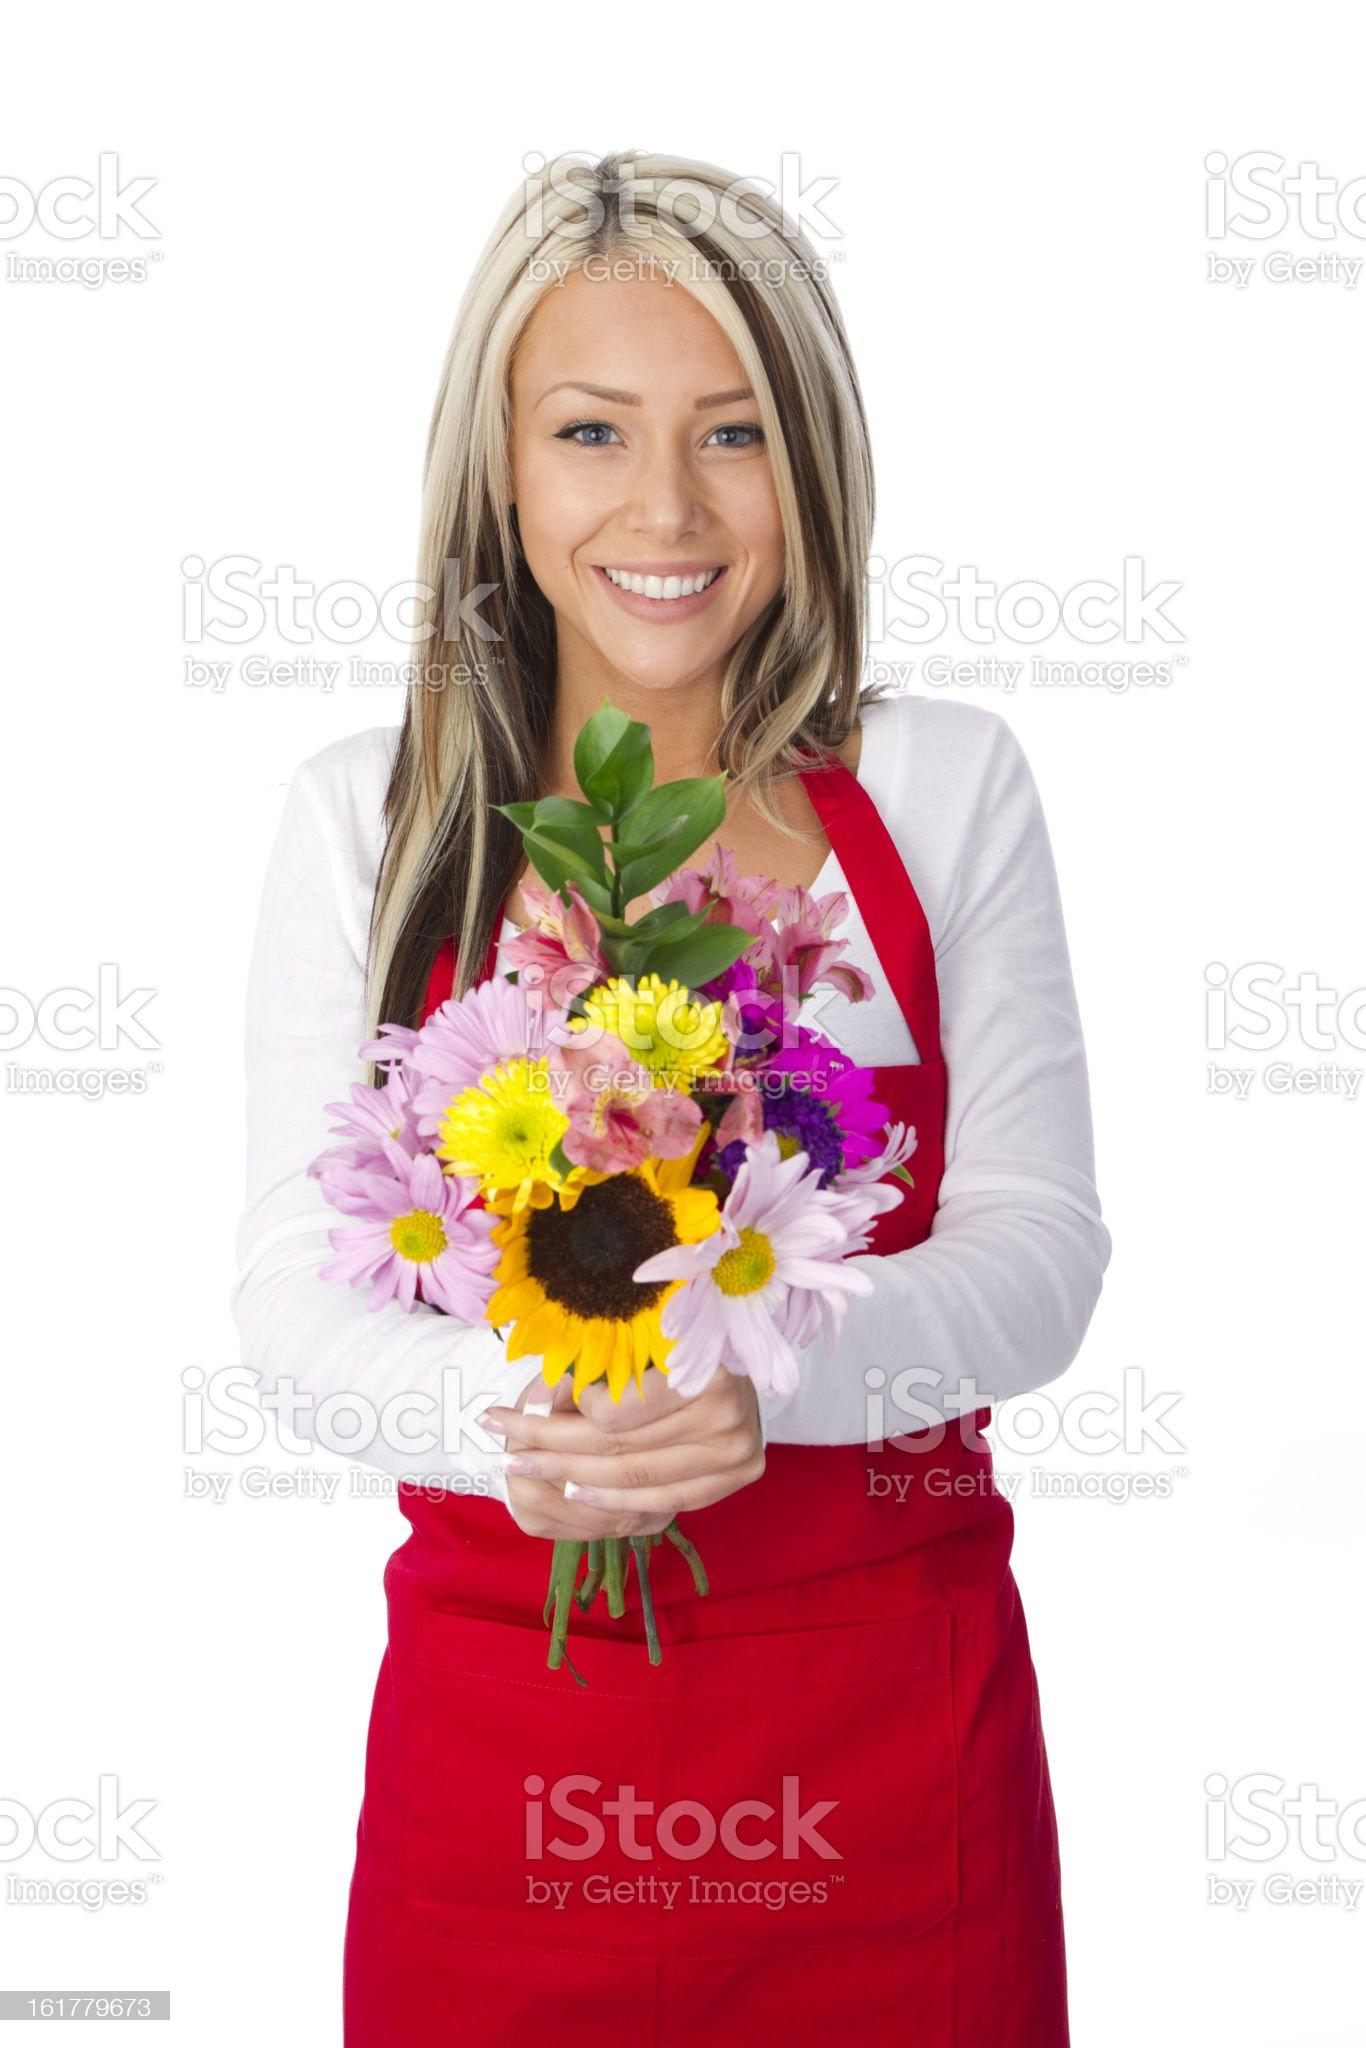 flower shop royalty-free stock photo